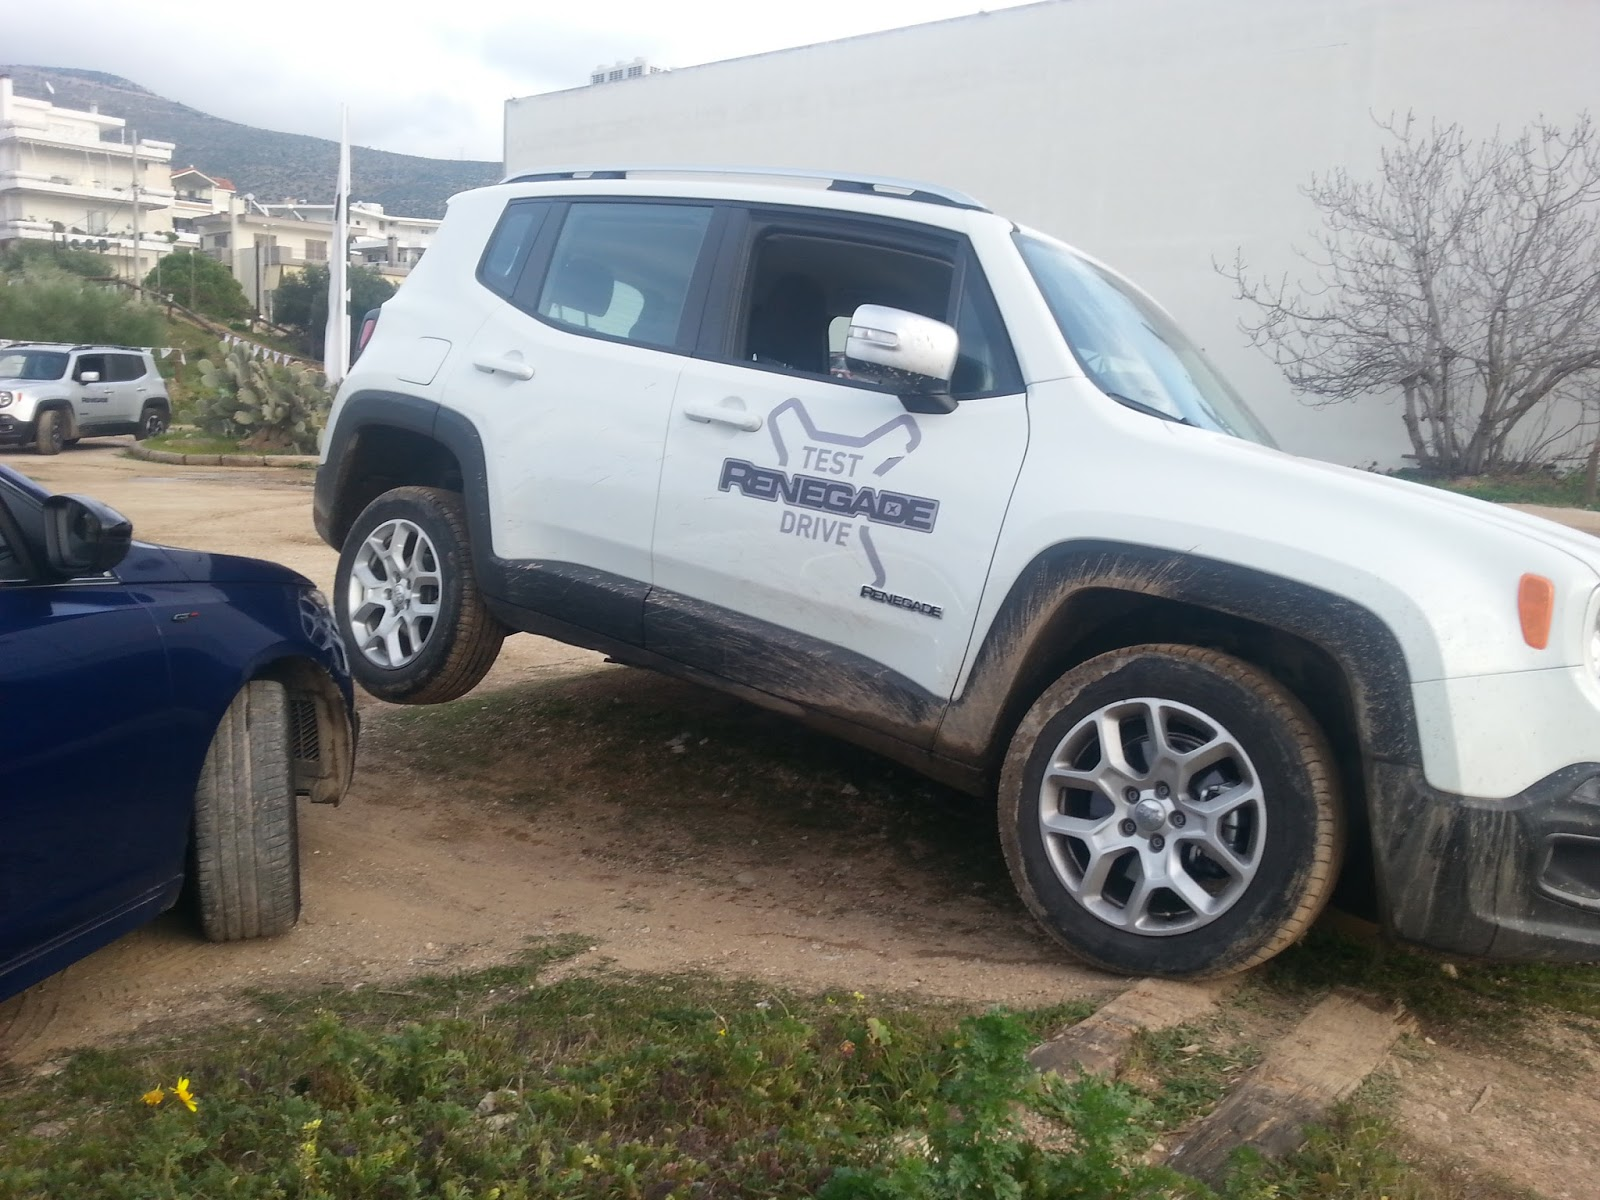 jeep%2Bvasiki Διαγωνισμός ξανά: Και θα οδηγήσεις το Renegade στη λάσπη και θα πάρεις δώρο! Jeep, Jeep Renegade, zblog, ΔΙΑΓΩΝΙΣΜΟΣ